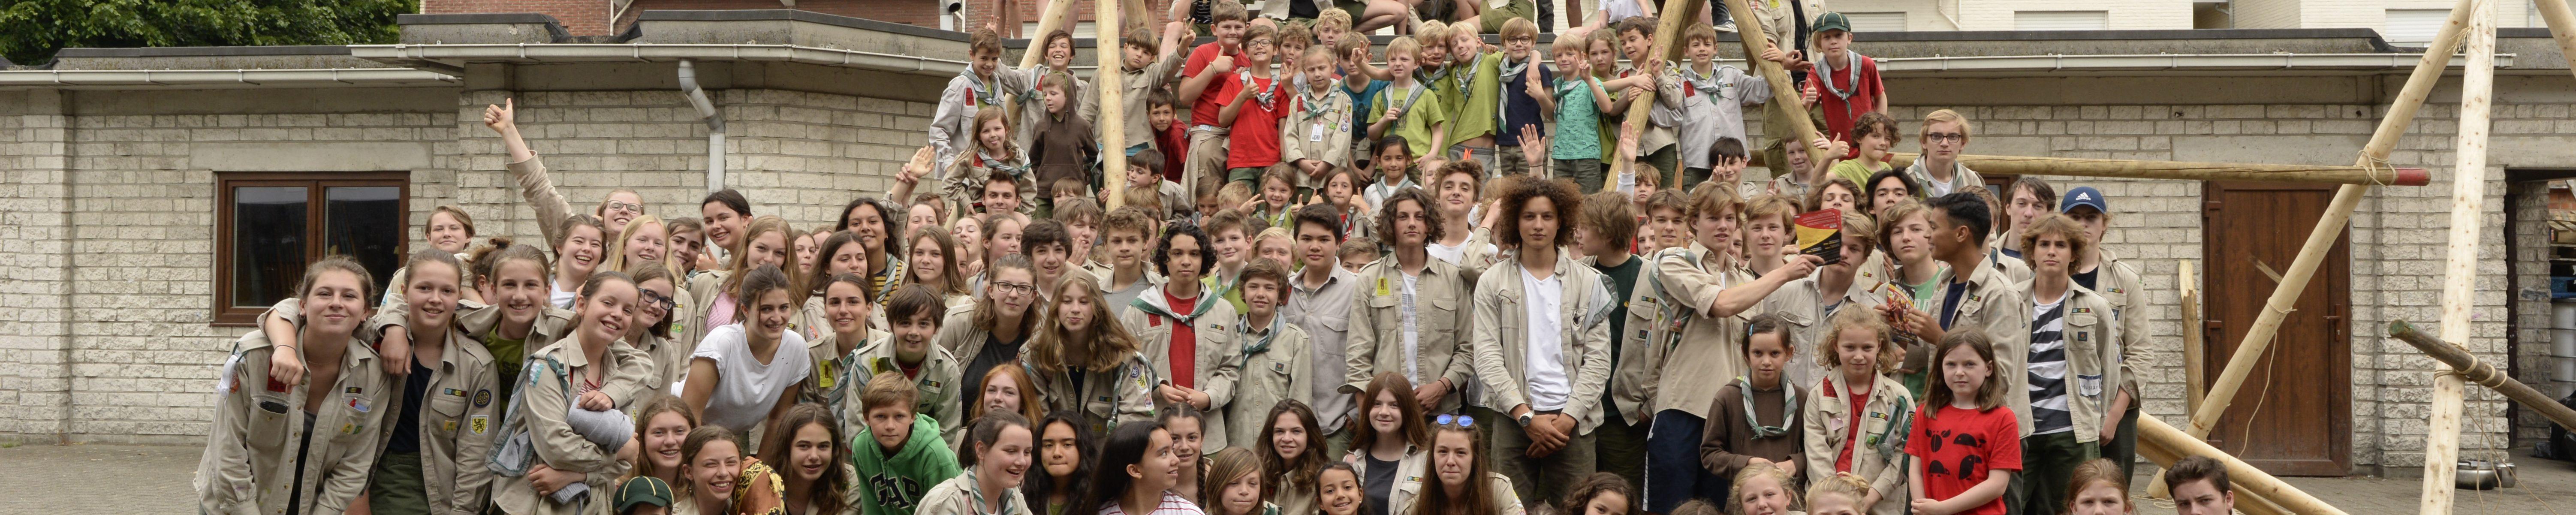 73 Scouts & Gidsen Oosterveld